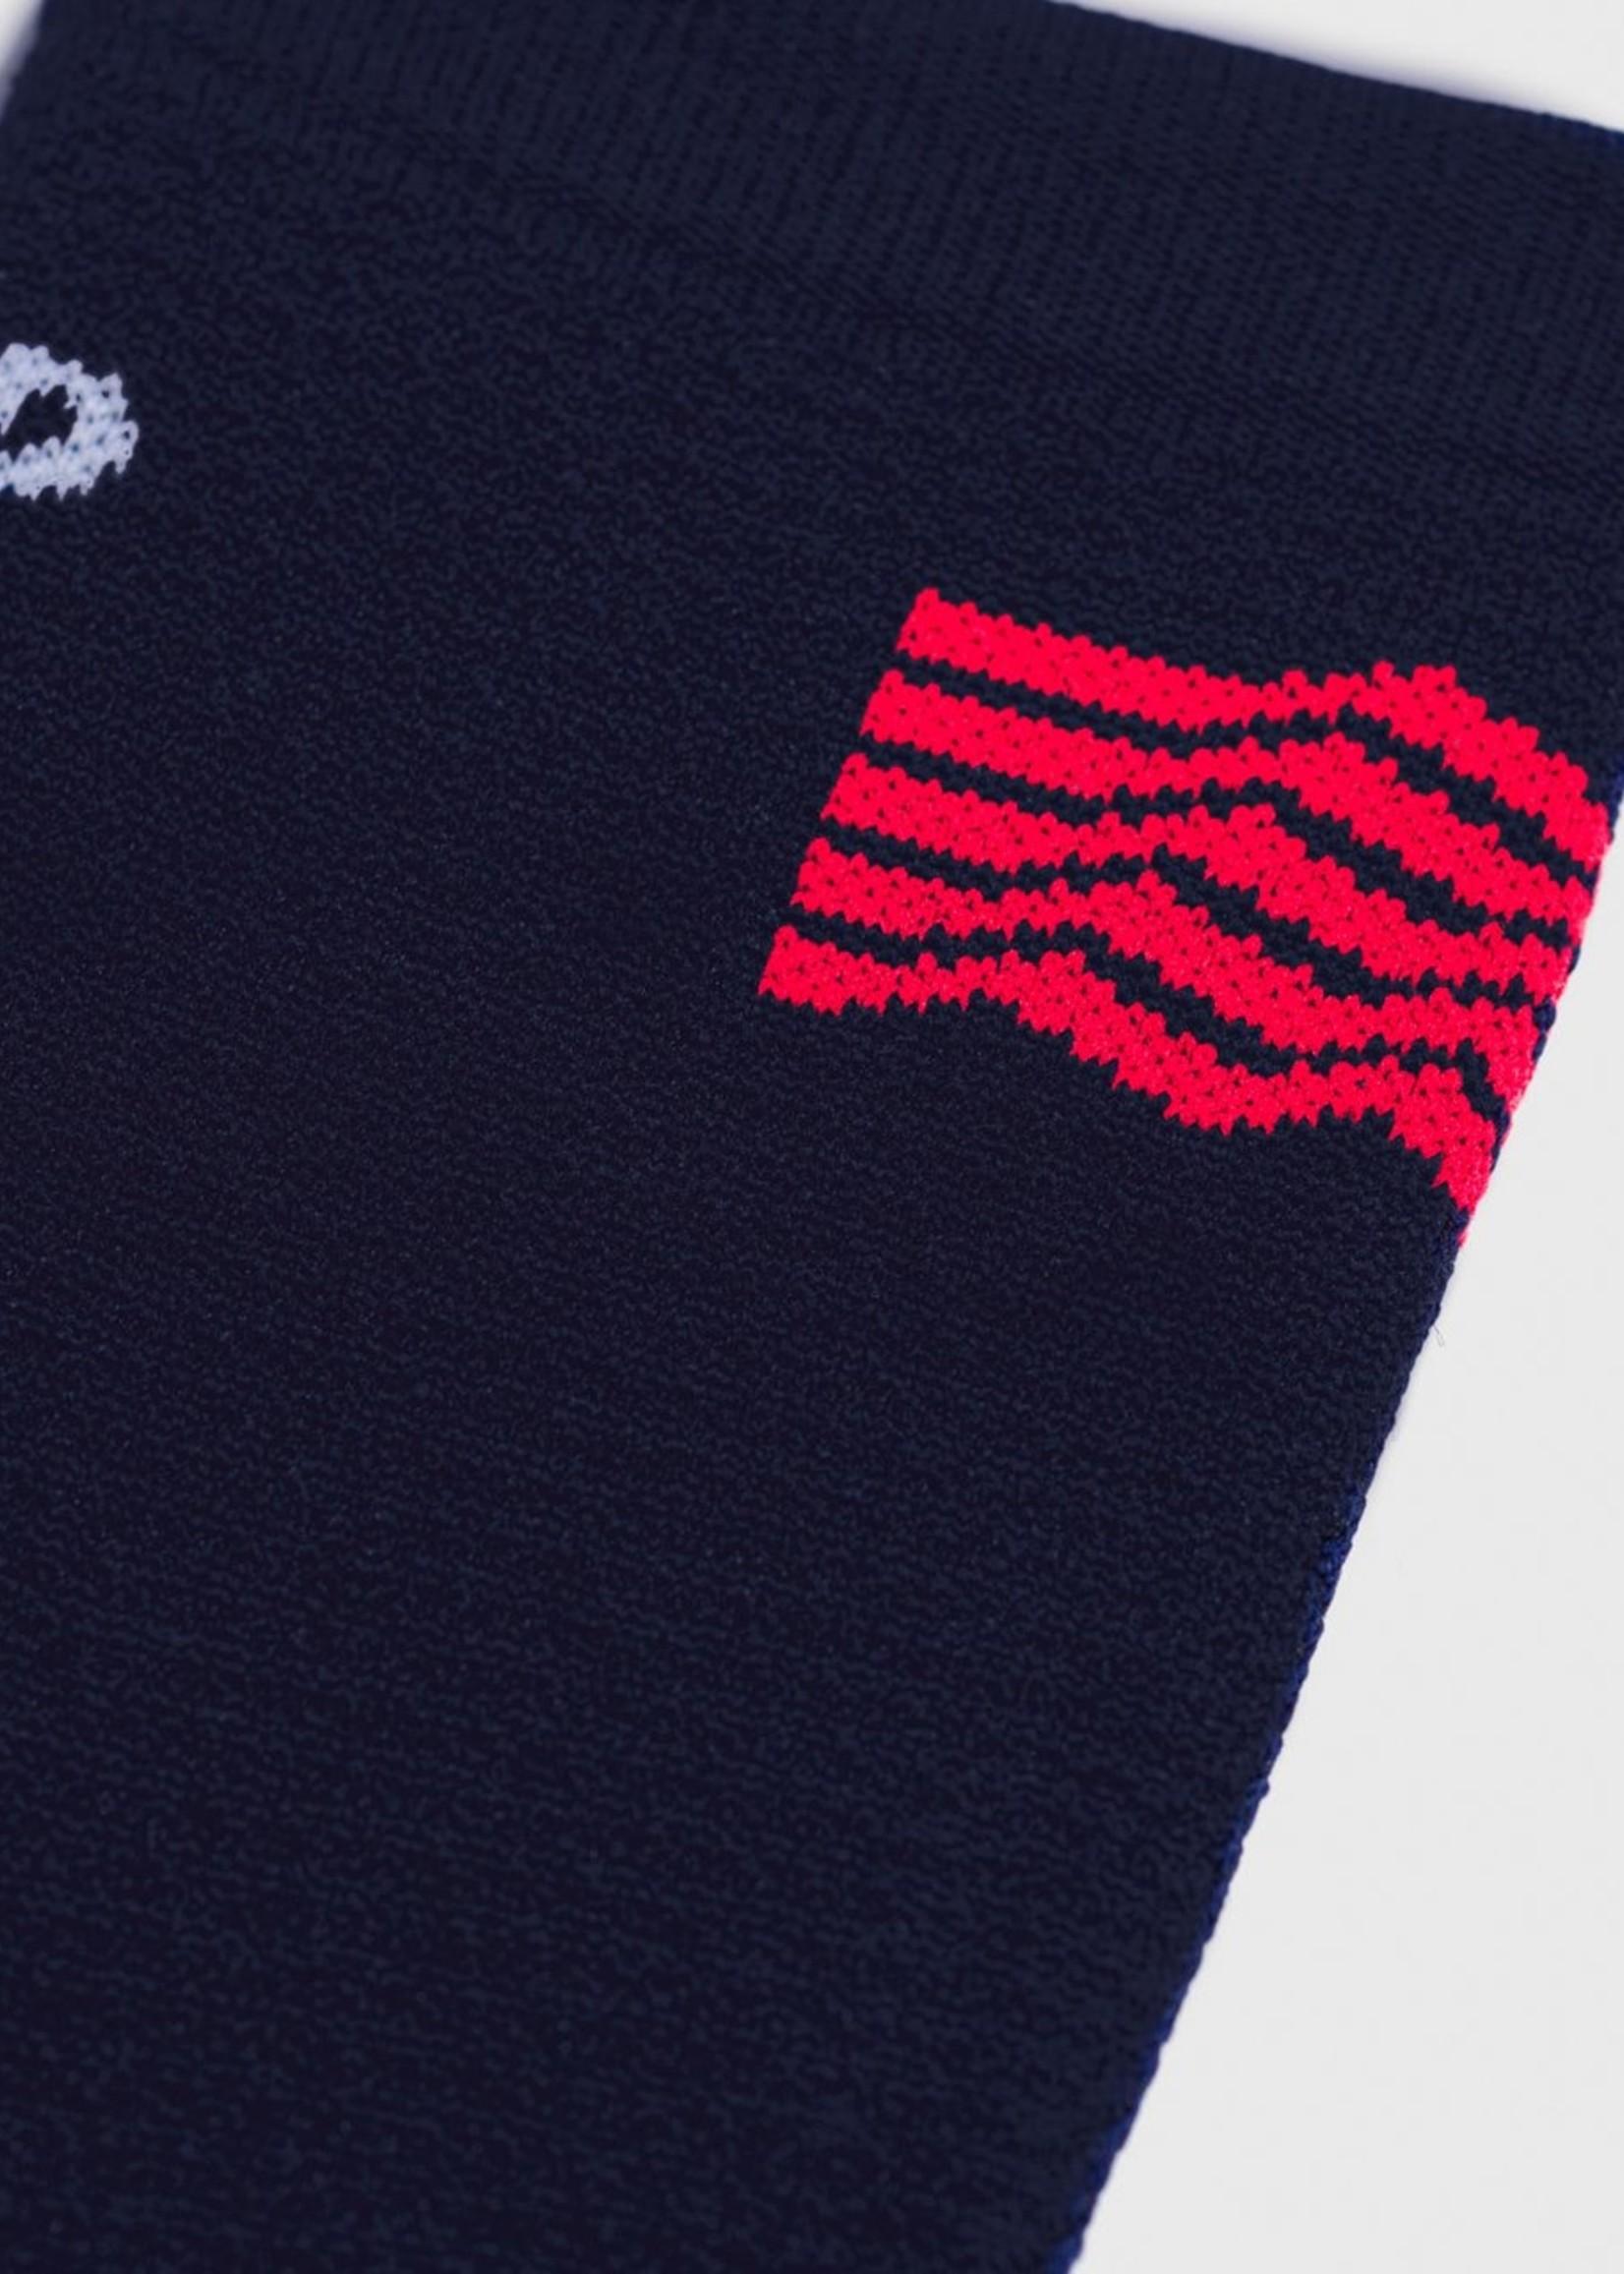 Maap Void Sock - Navy